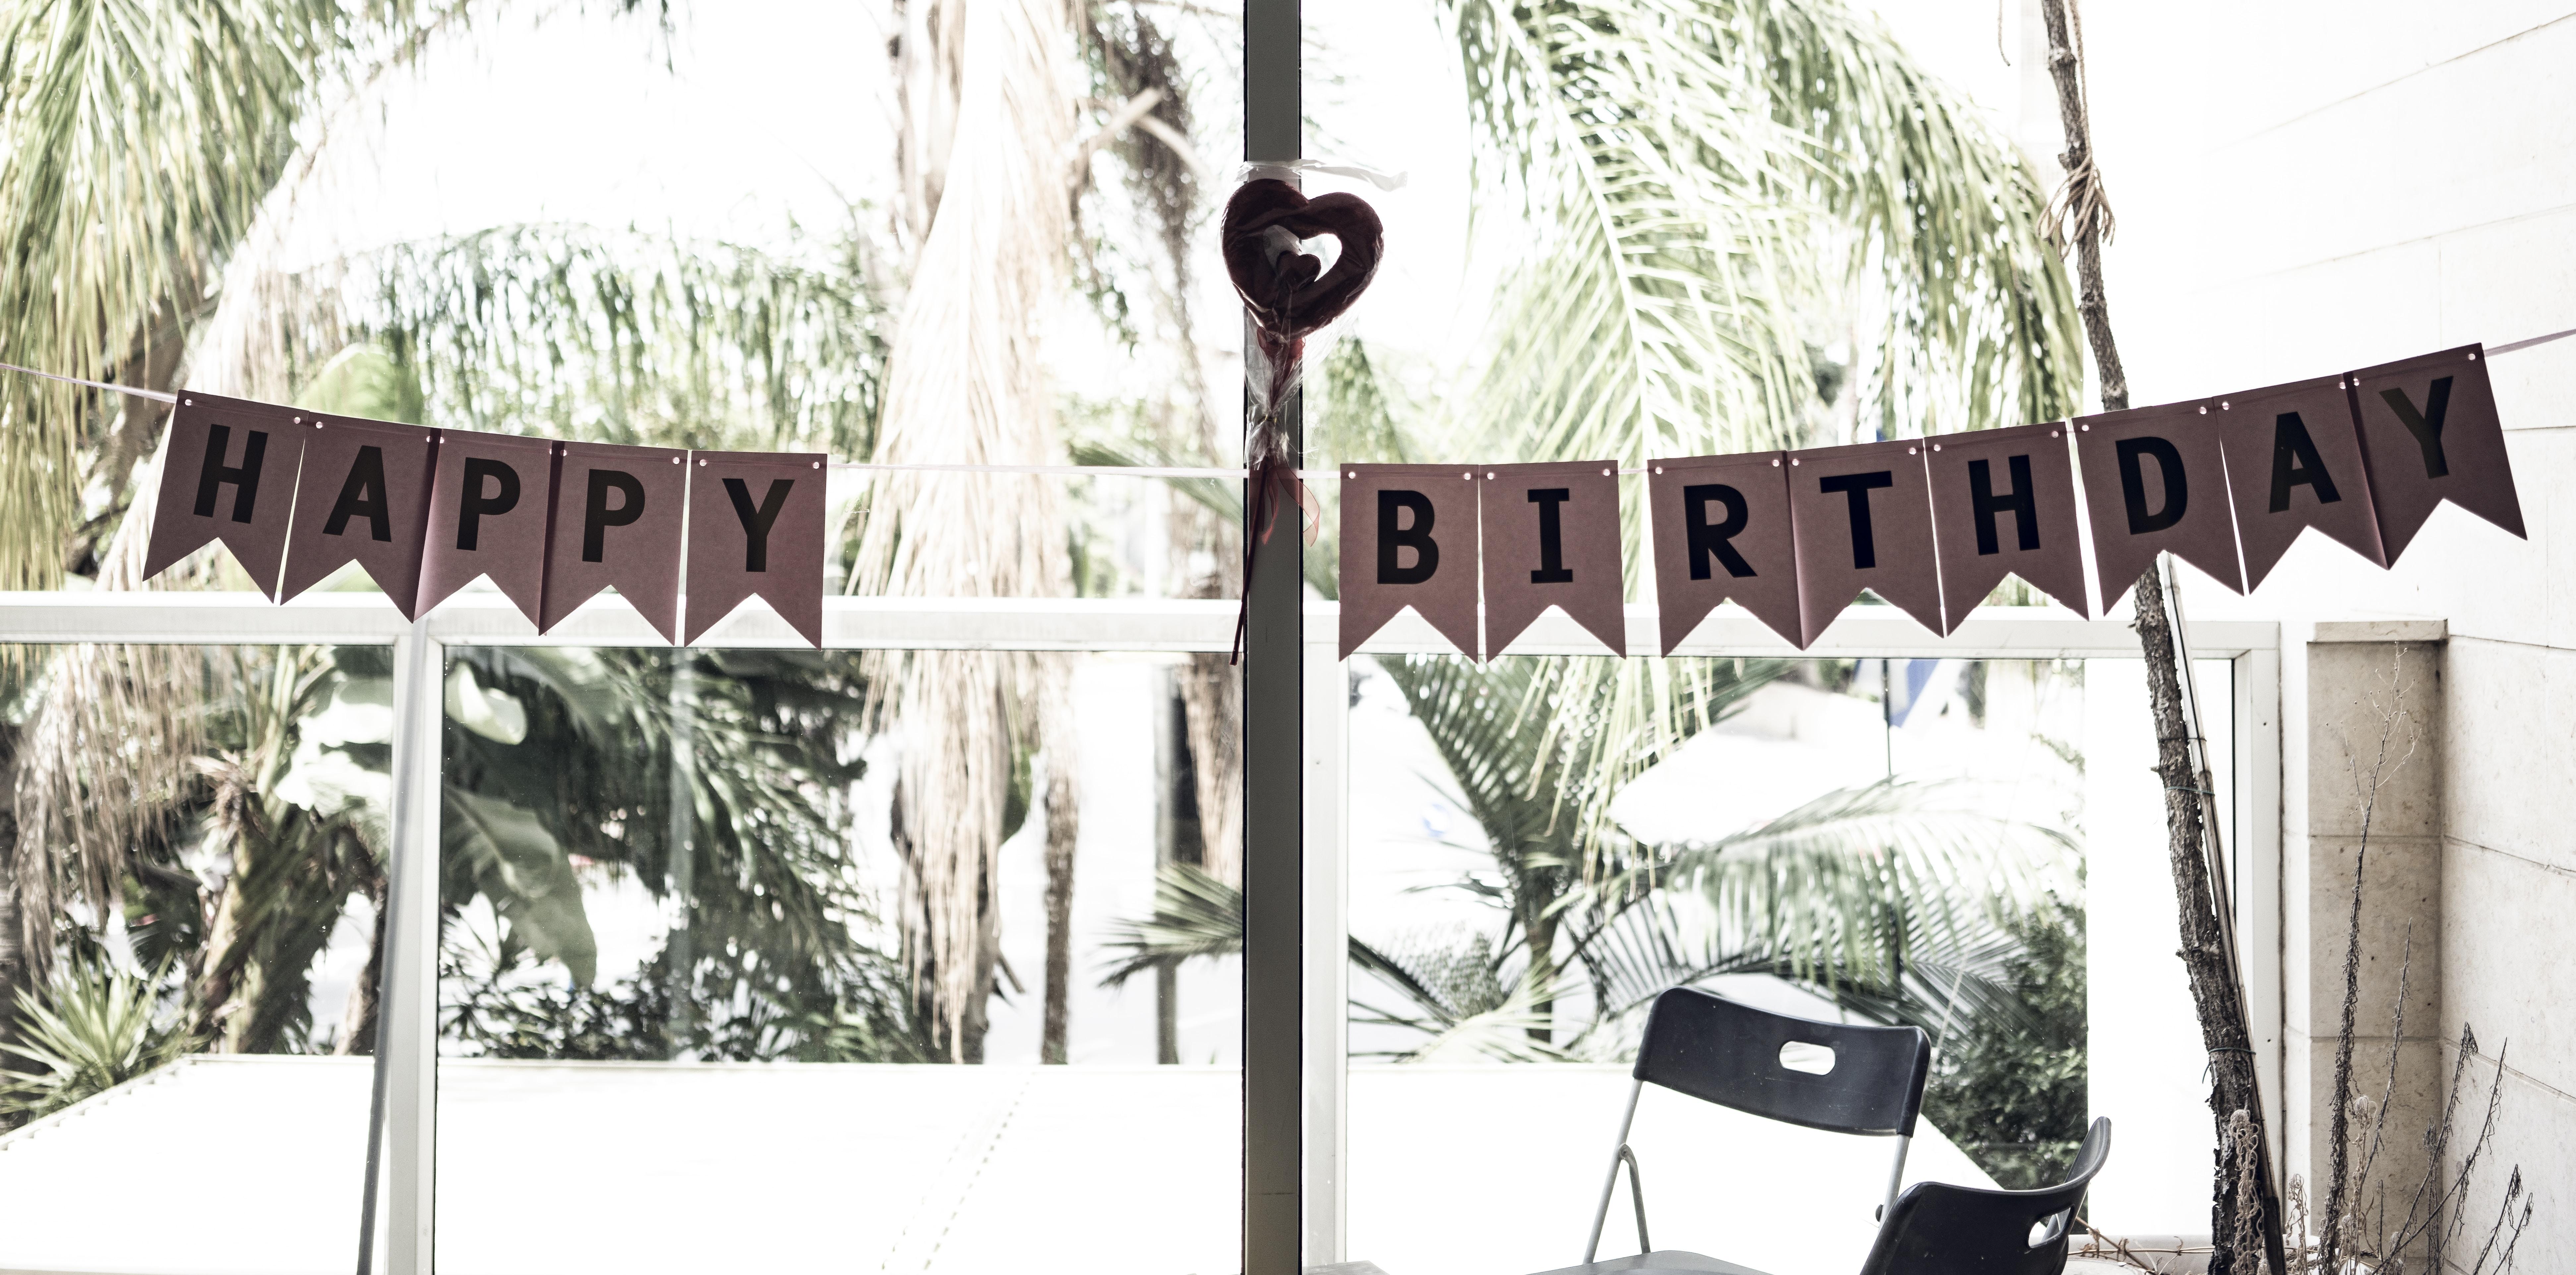 black chair near happy birthday bunting